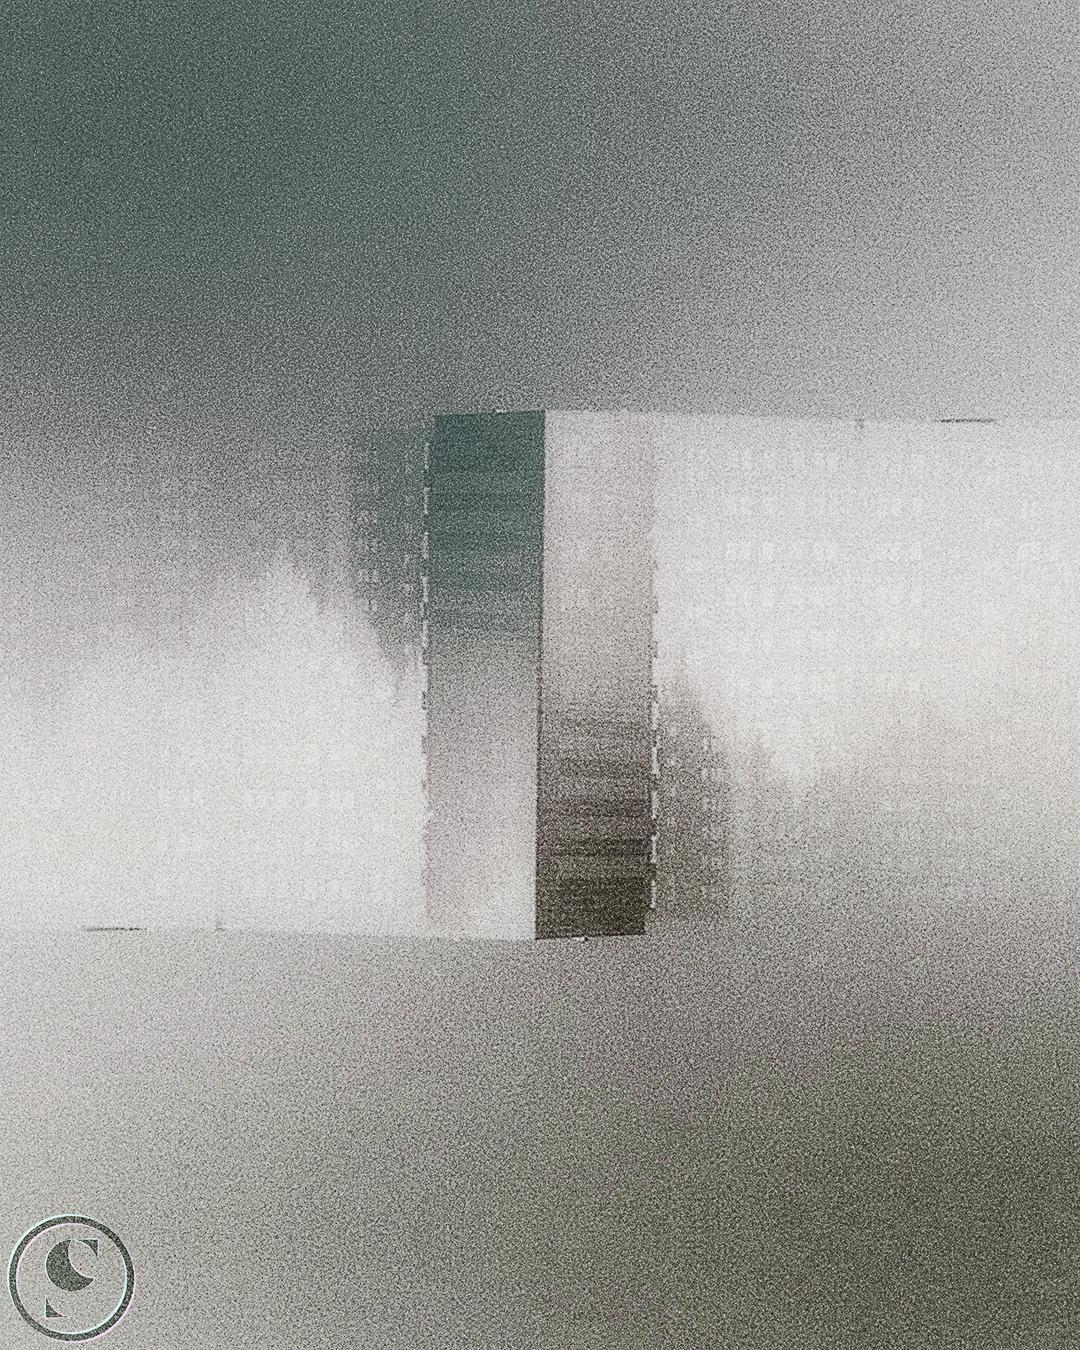 19-07-31-Fog1Insta8BWM.jpg